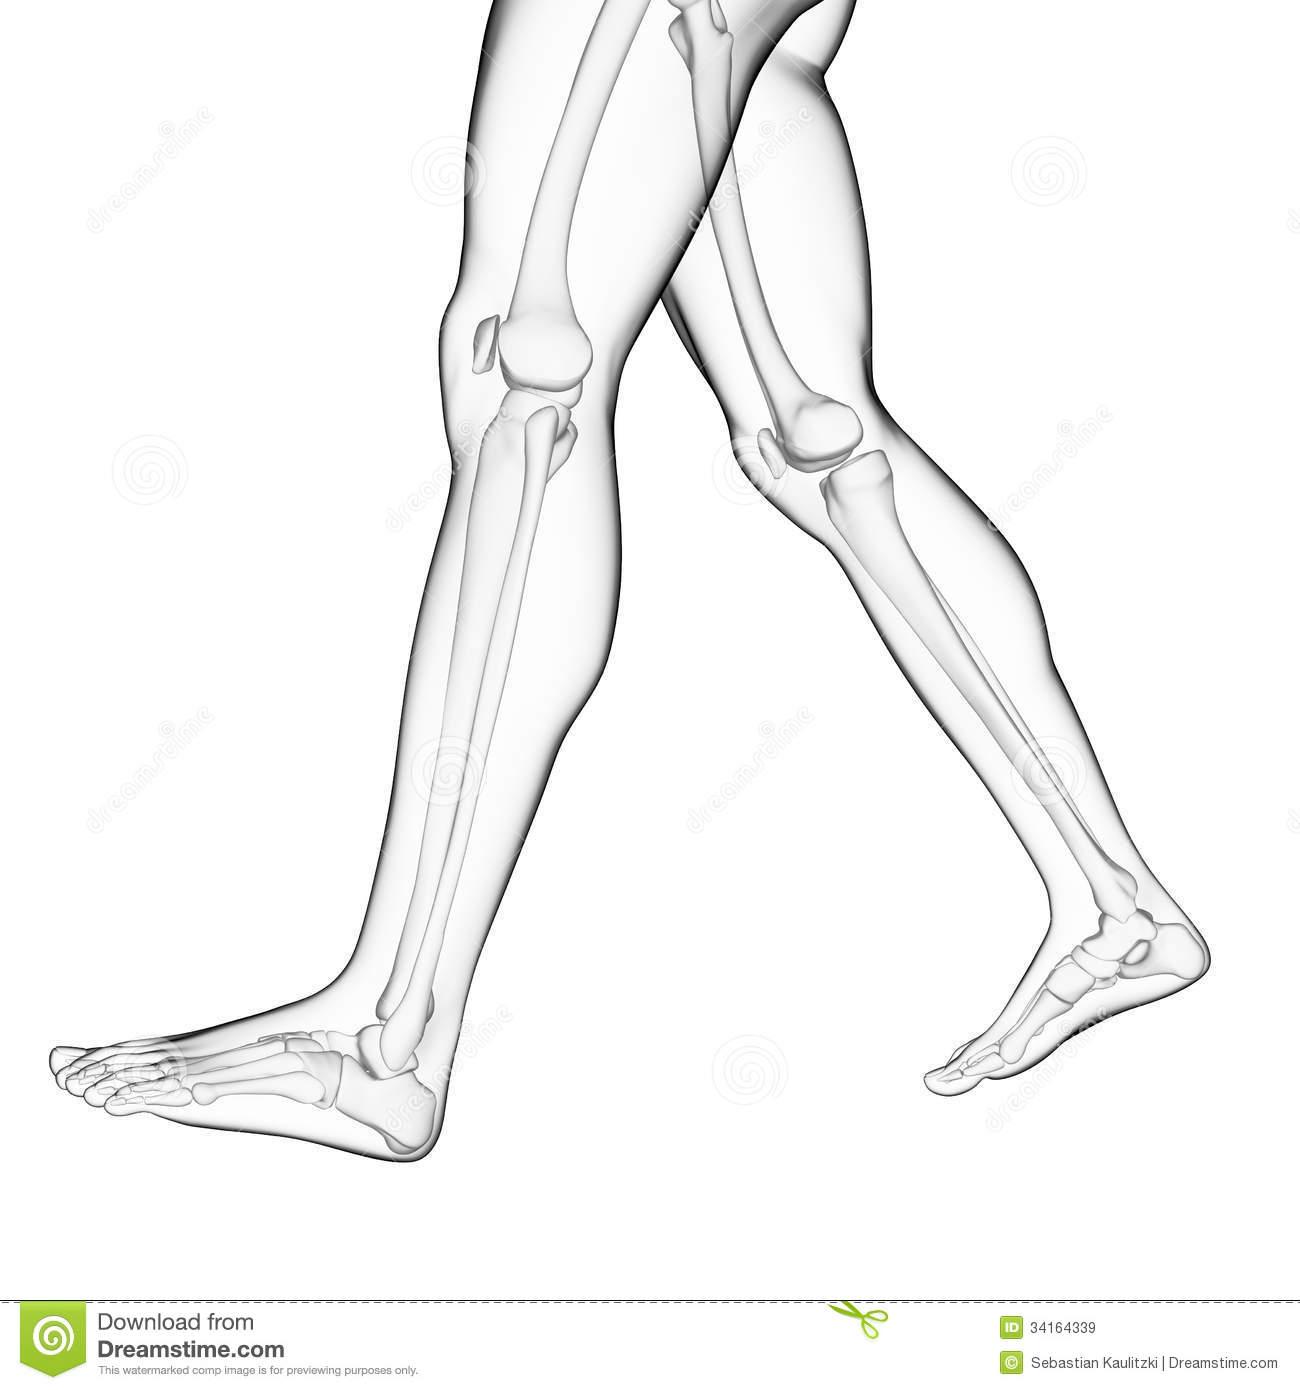 Bones clipart leg bone Drawing bone Leg leg Clipart